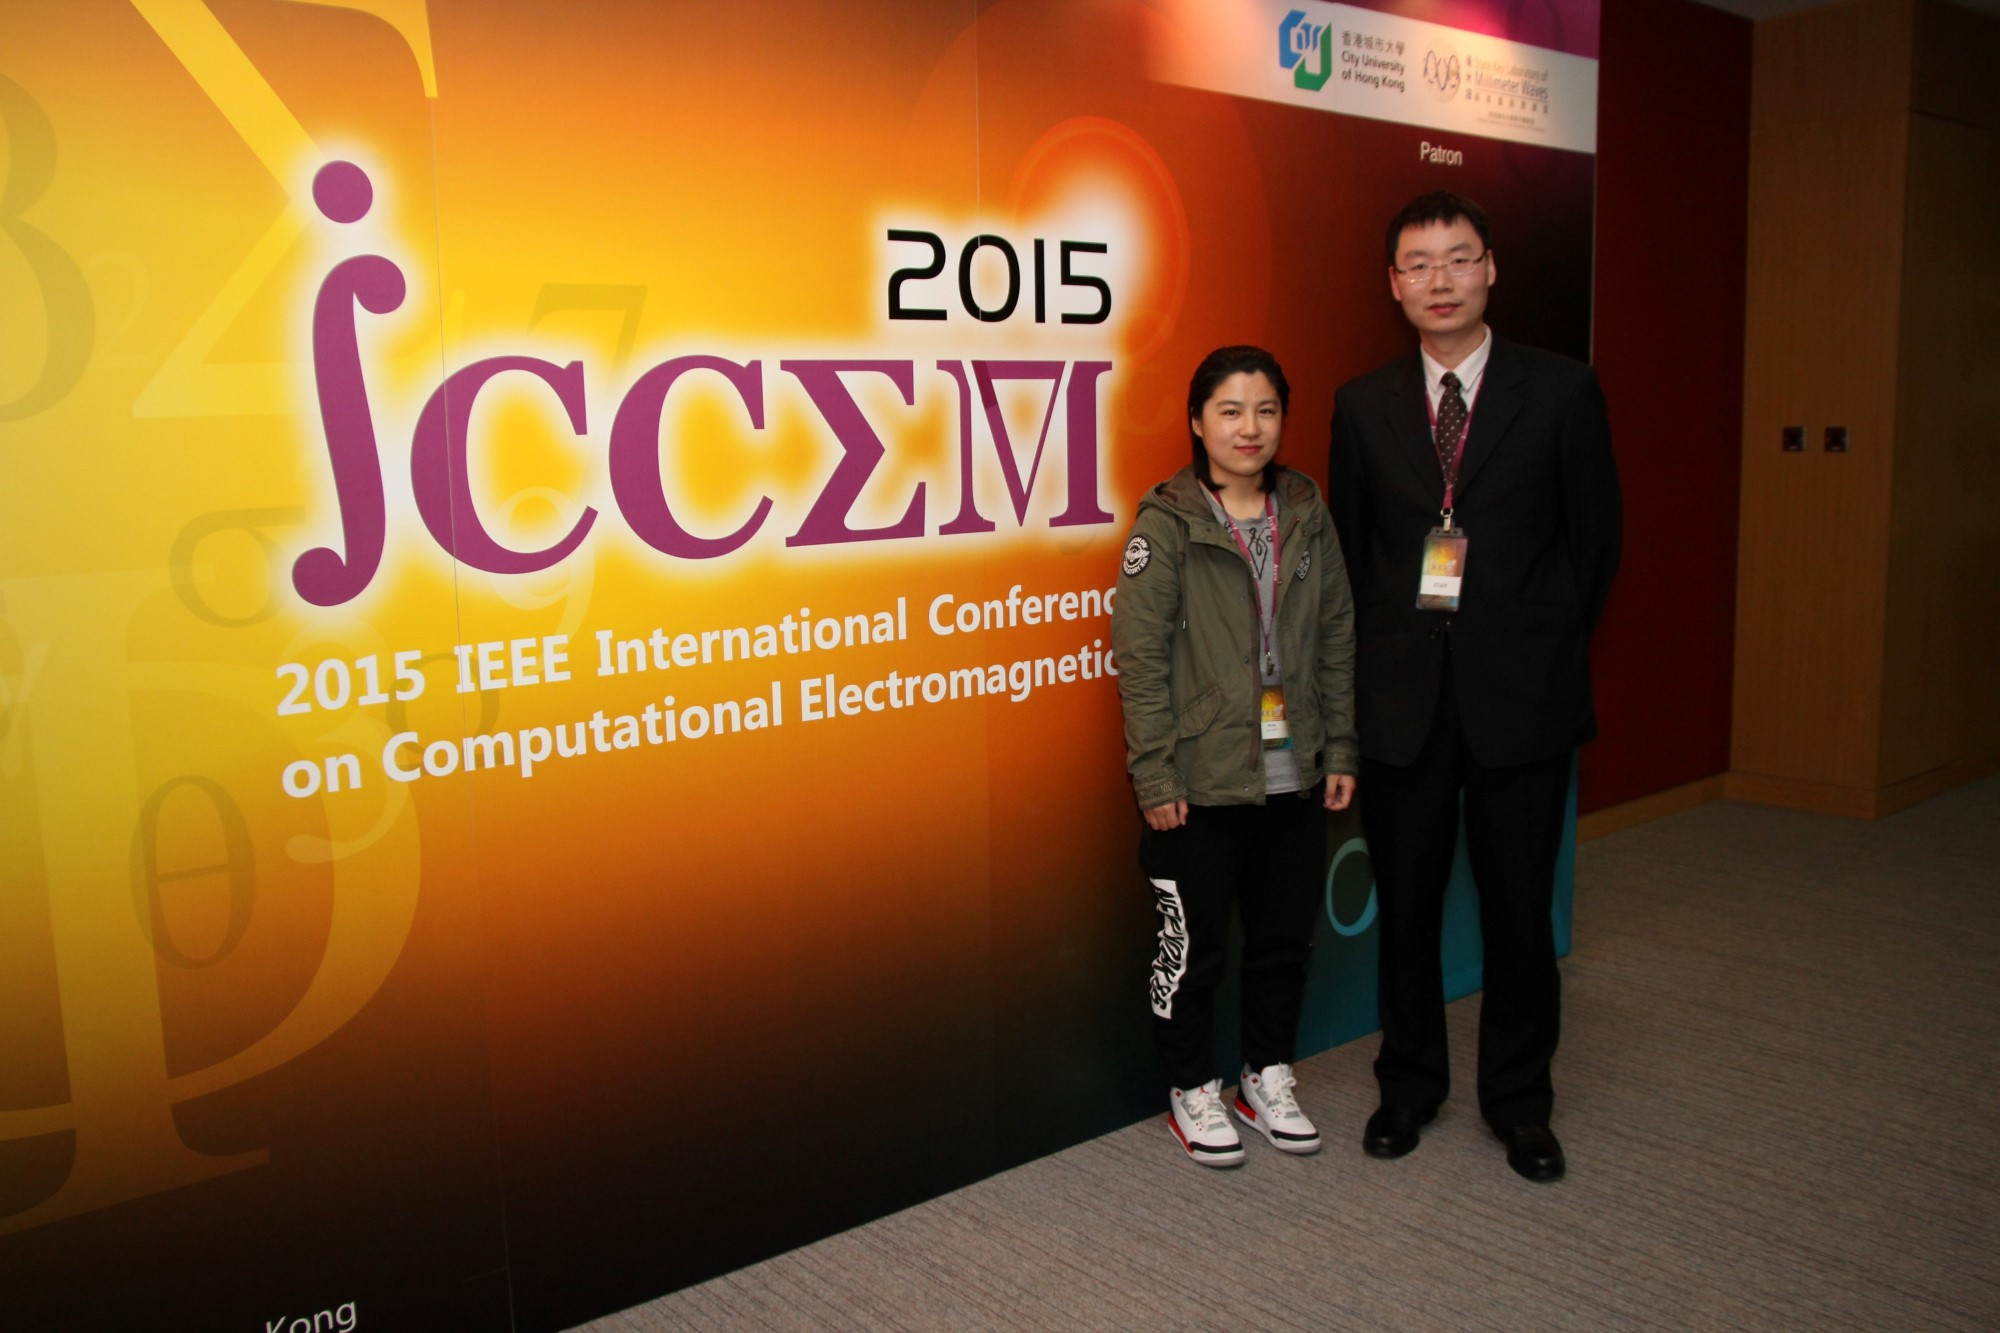 2015 IEEE International Conference on Computational